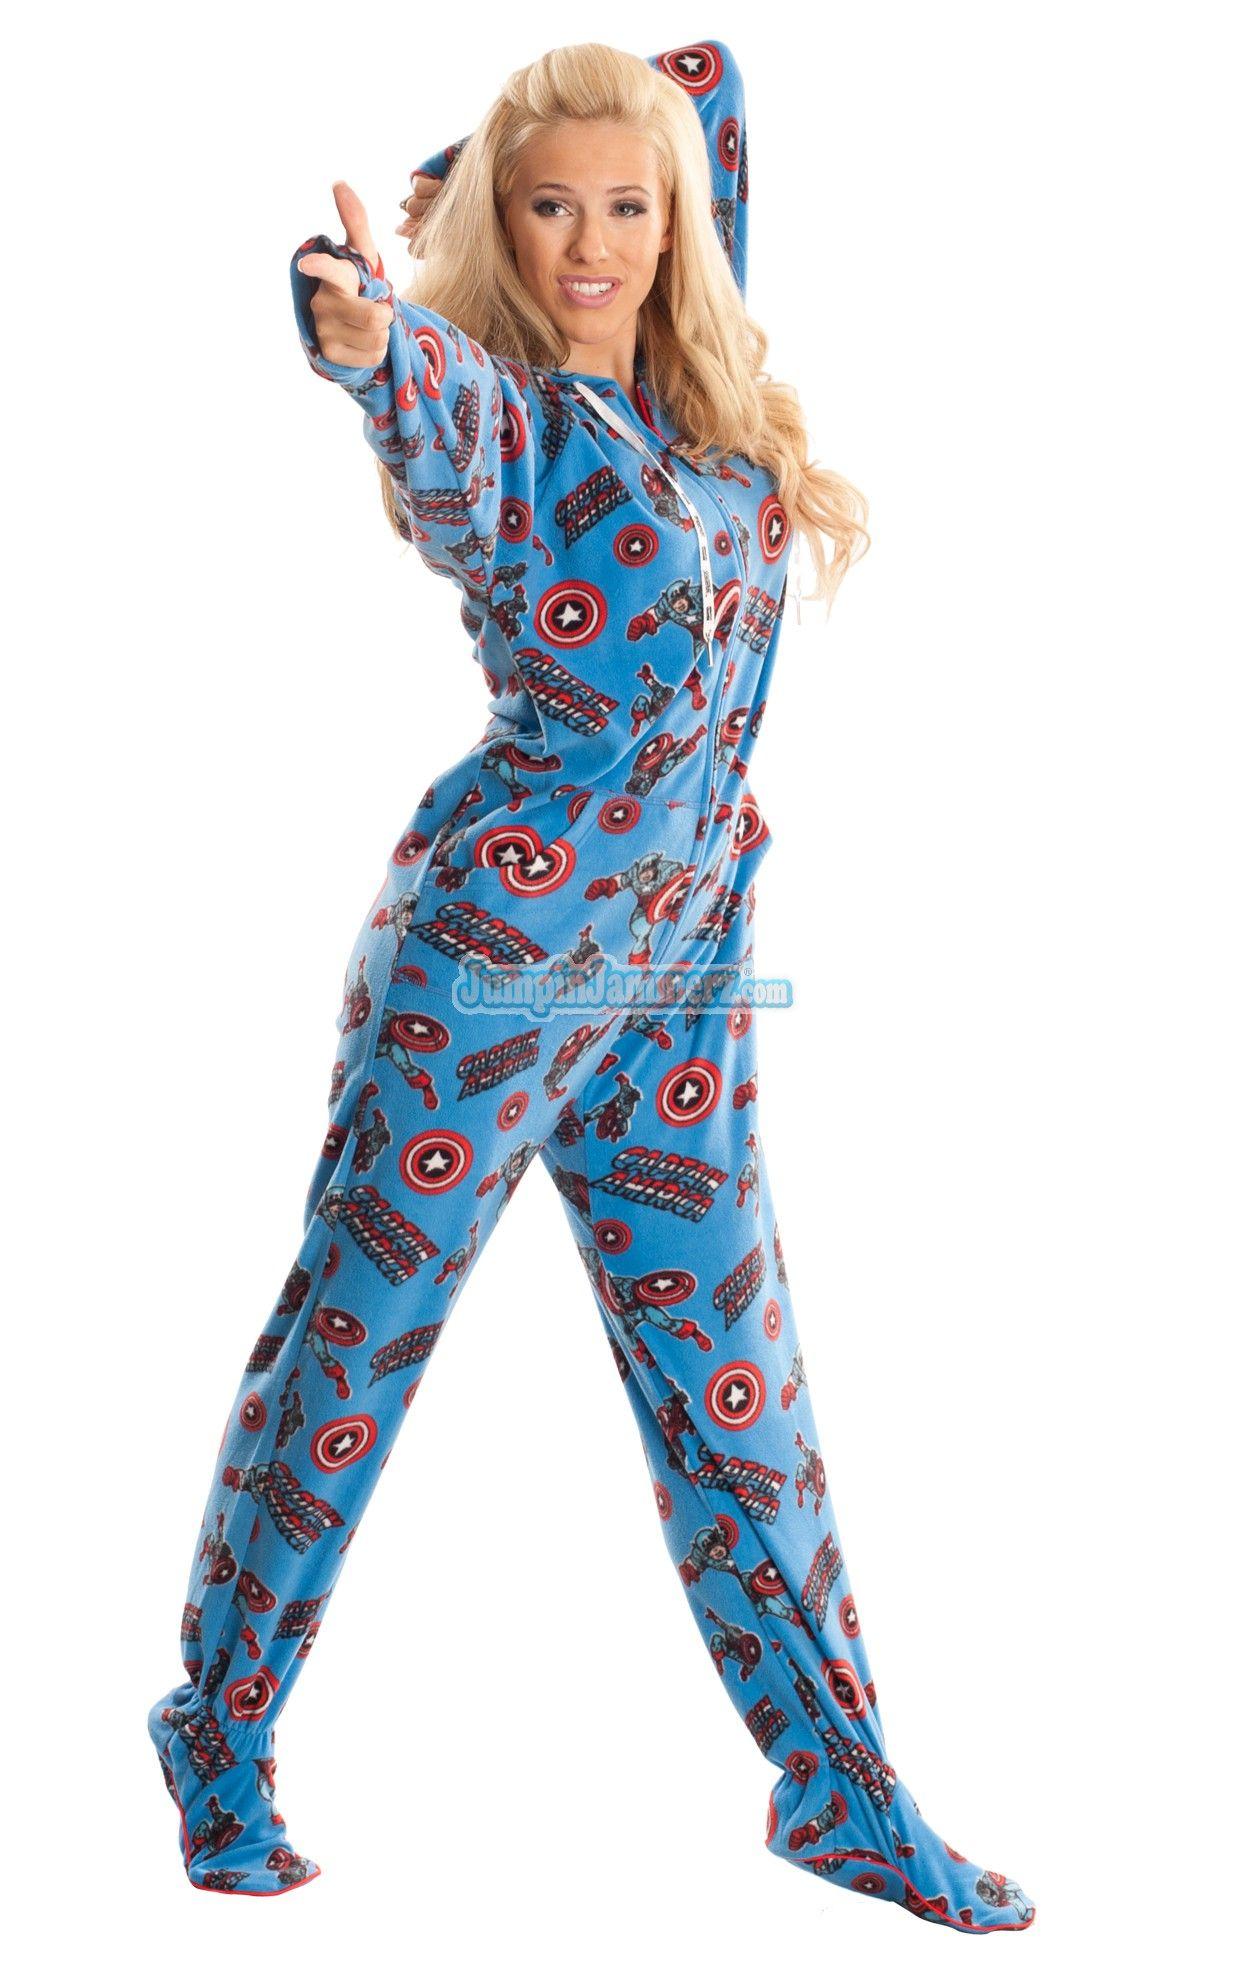 36fb6fbd17 Captain America - Marvel Comics - Pajamas Footie PJs Onesies One Piece Adult  Pajamas. I NEED THIS.